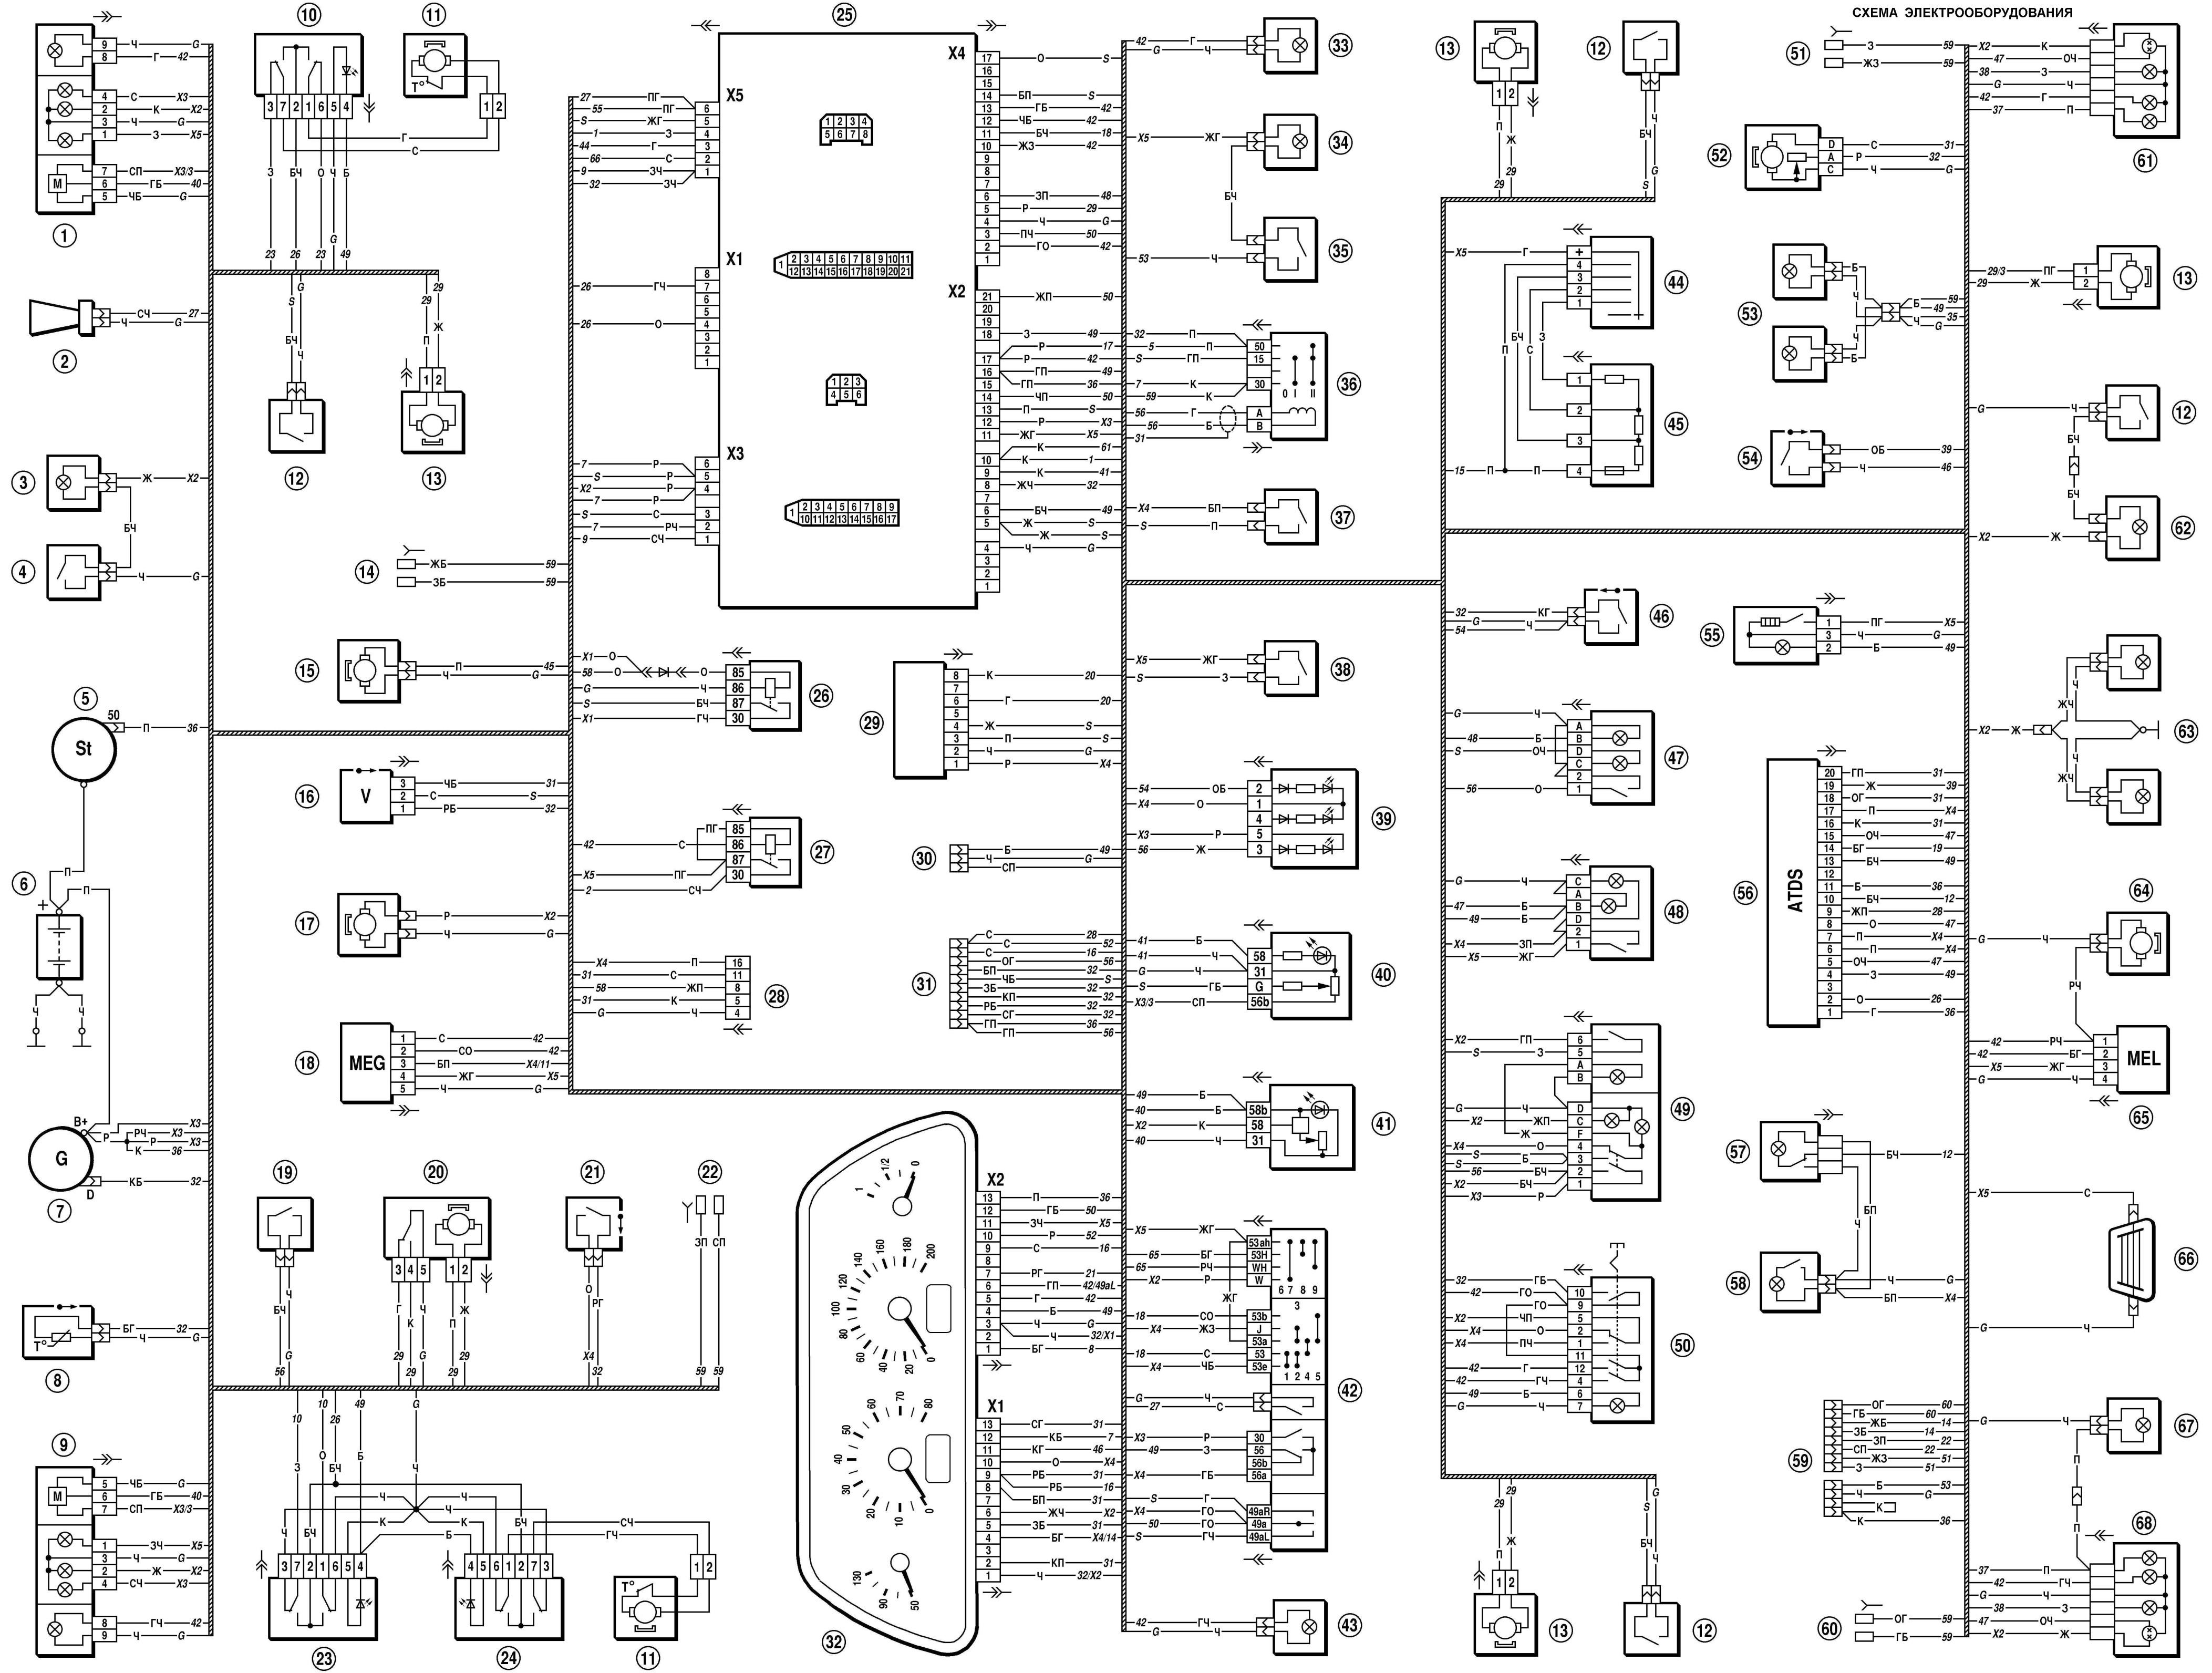 Схема электрооборудования шевроле нива 2123, схема niva chevrolet.